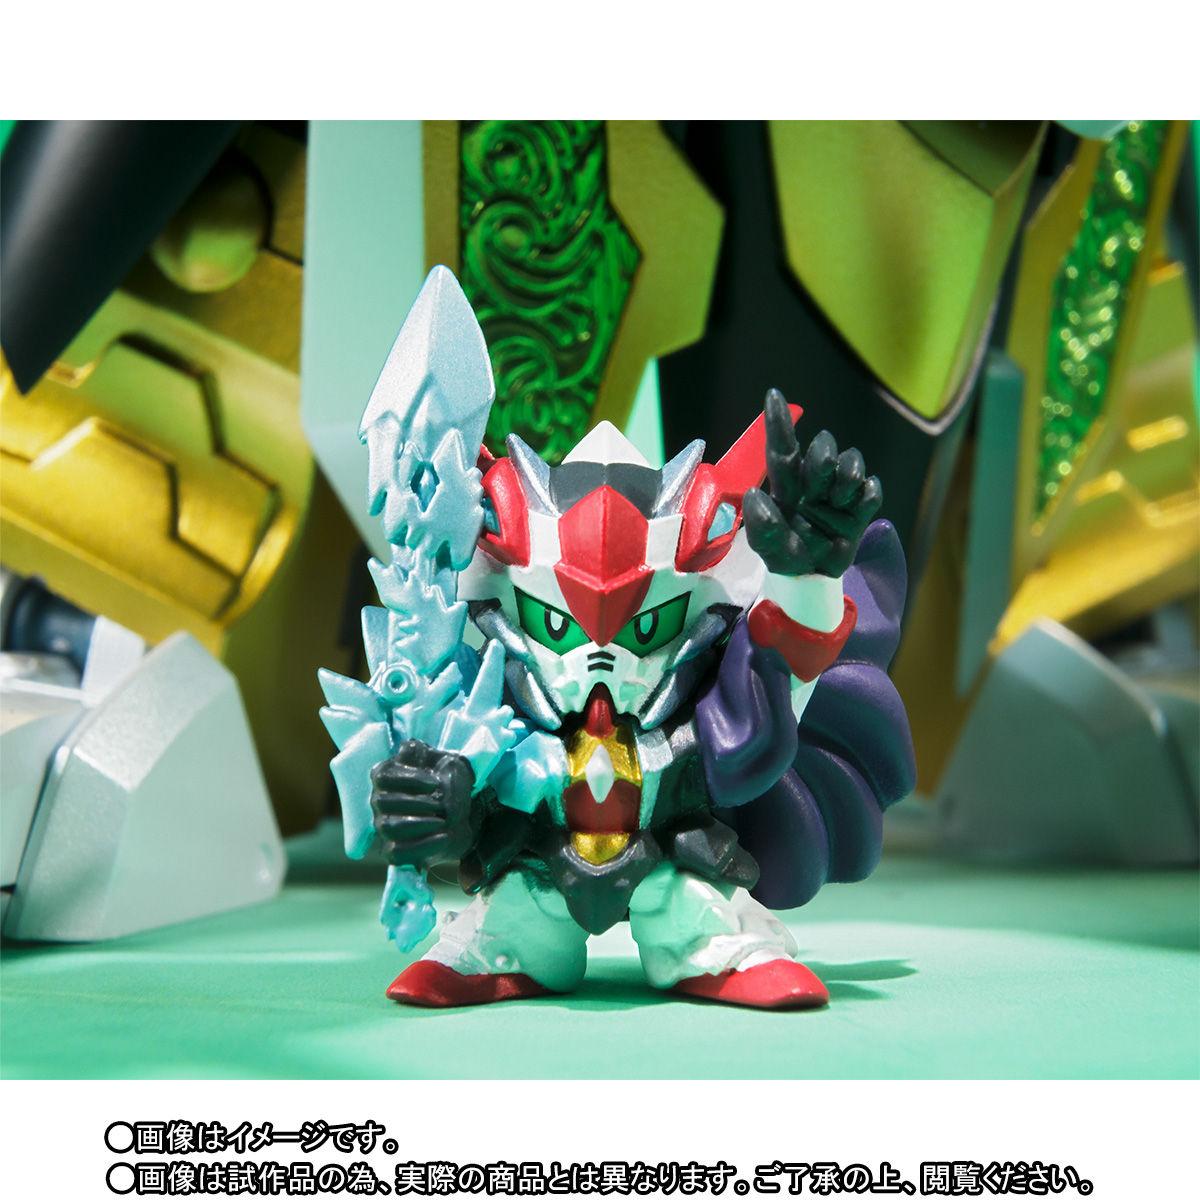 SDX『龍機ドラグーン 新SDガンダム外伝』可変可動フィギュア-008